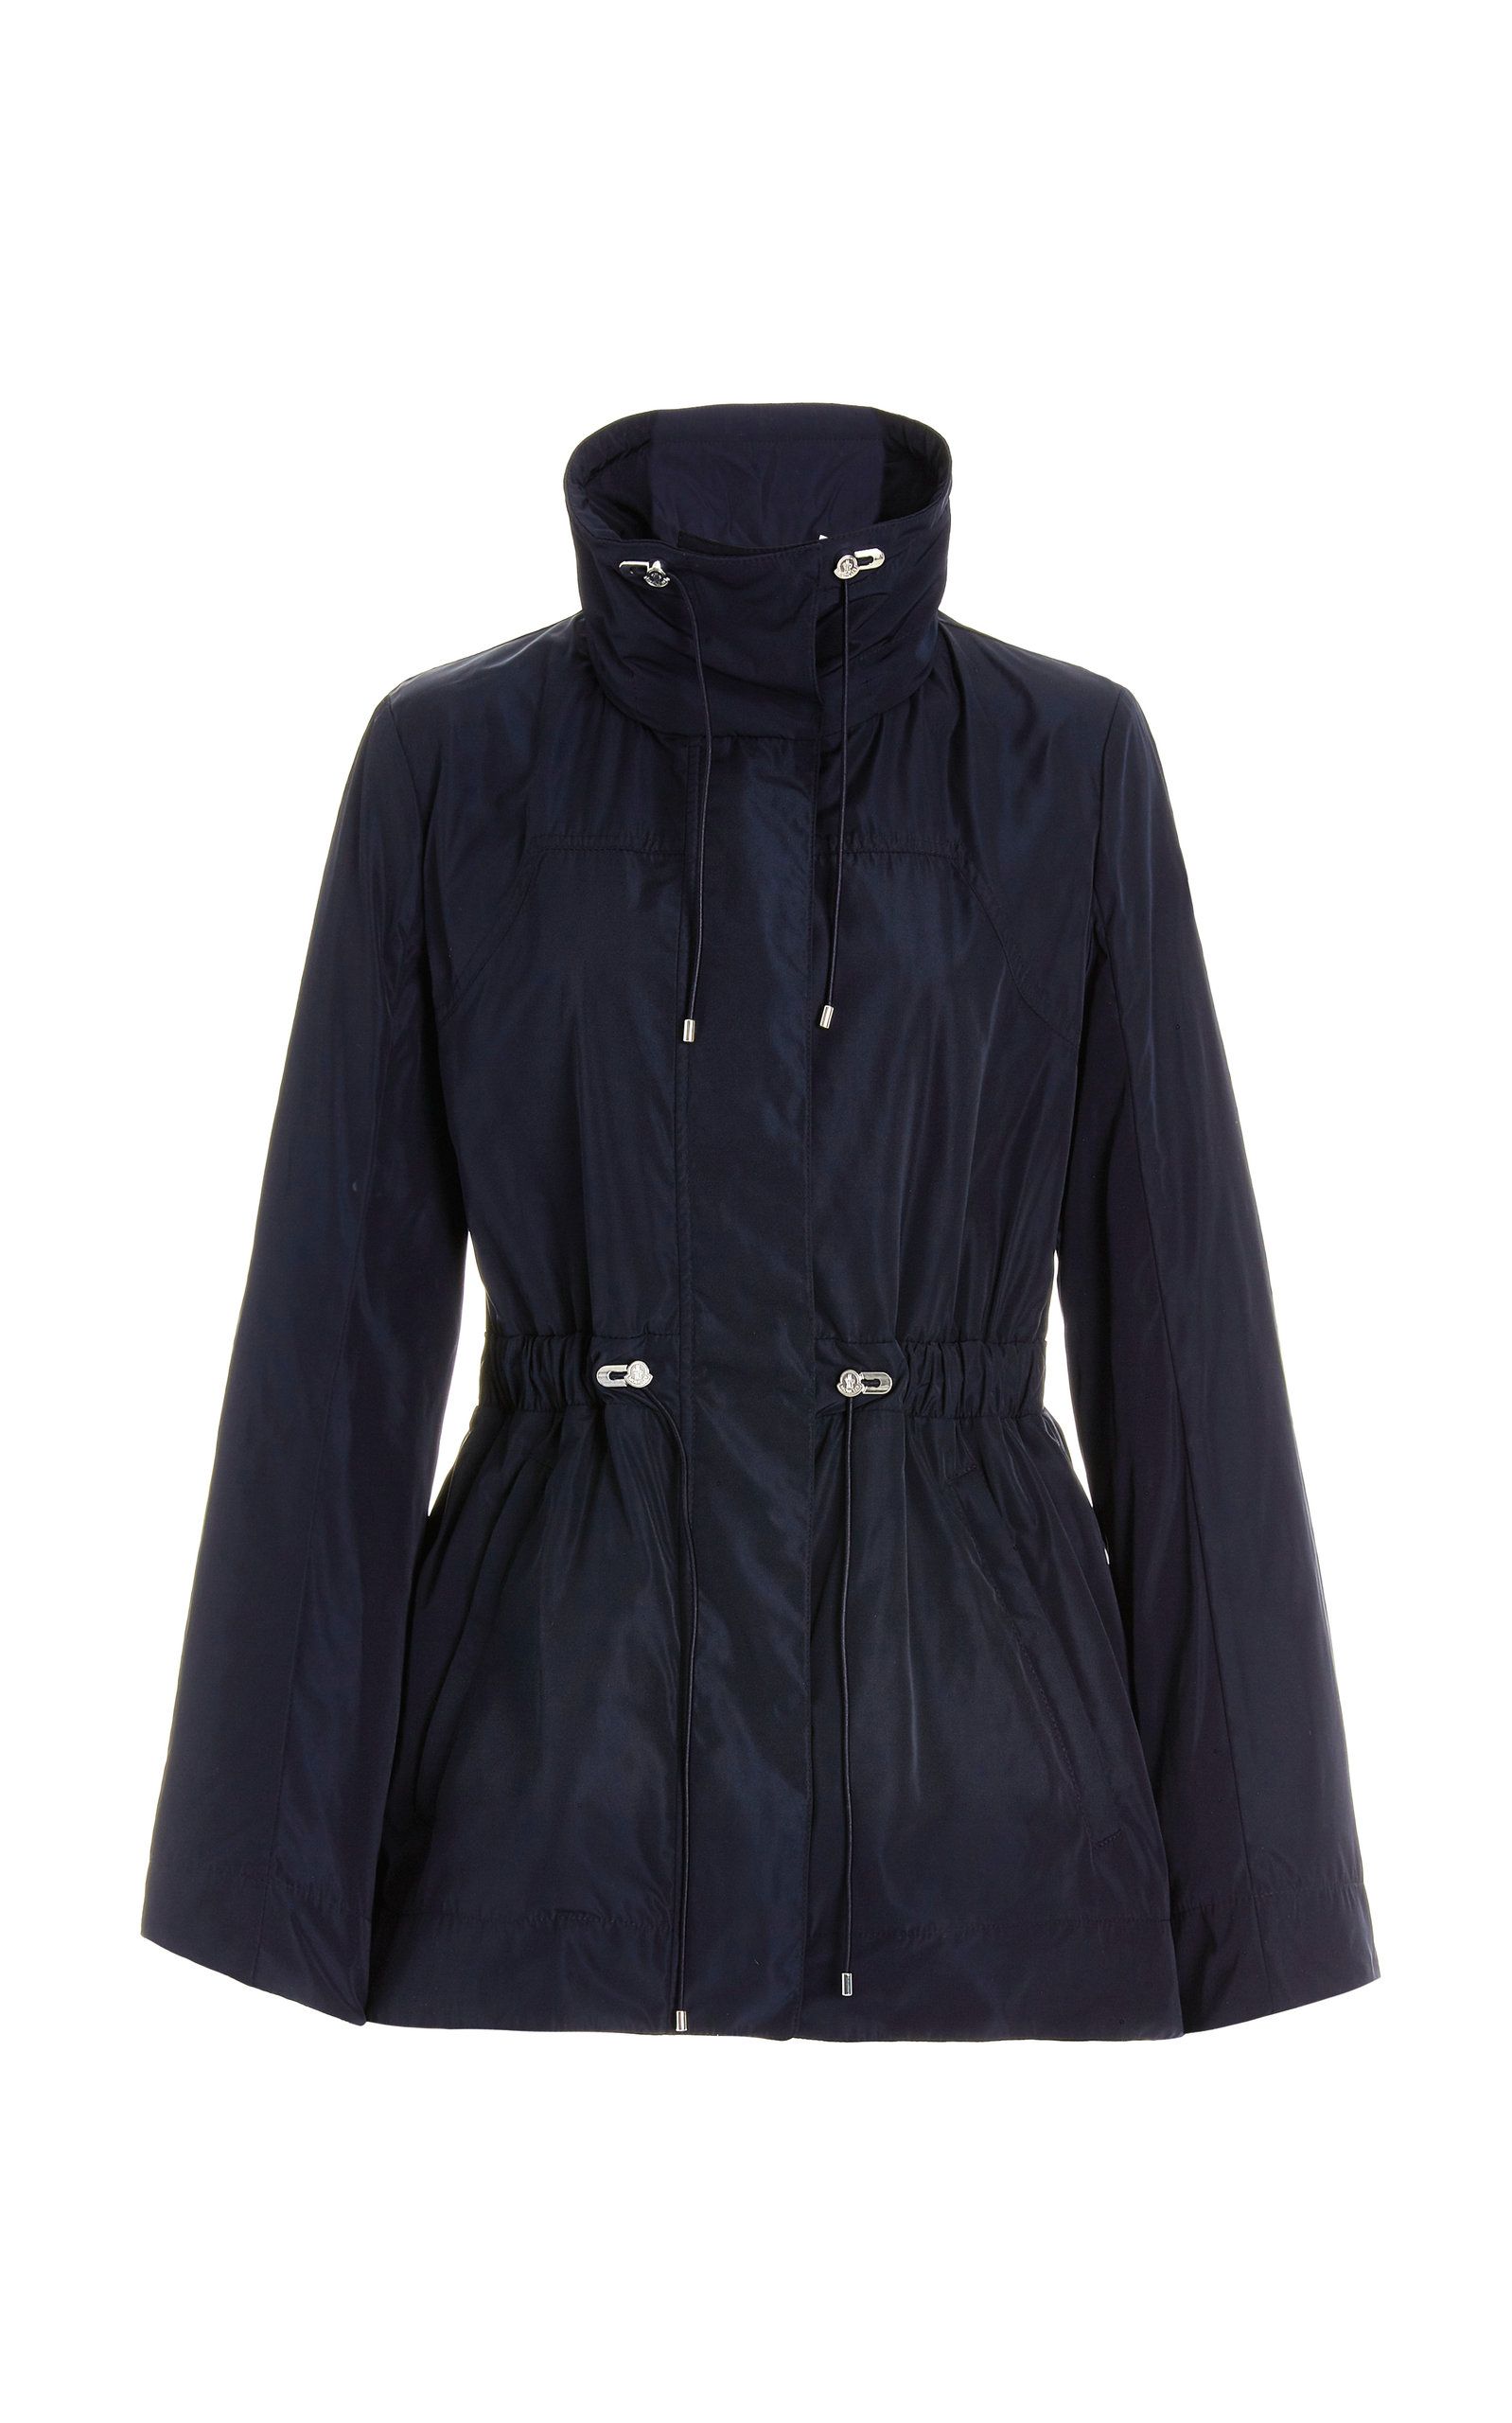 Moncler - Women's Ocre Drawstring-Detailed Shell Jacket - Navy - Moda Operandi